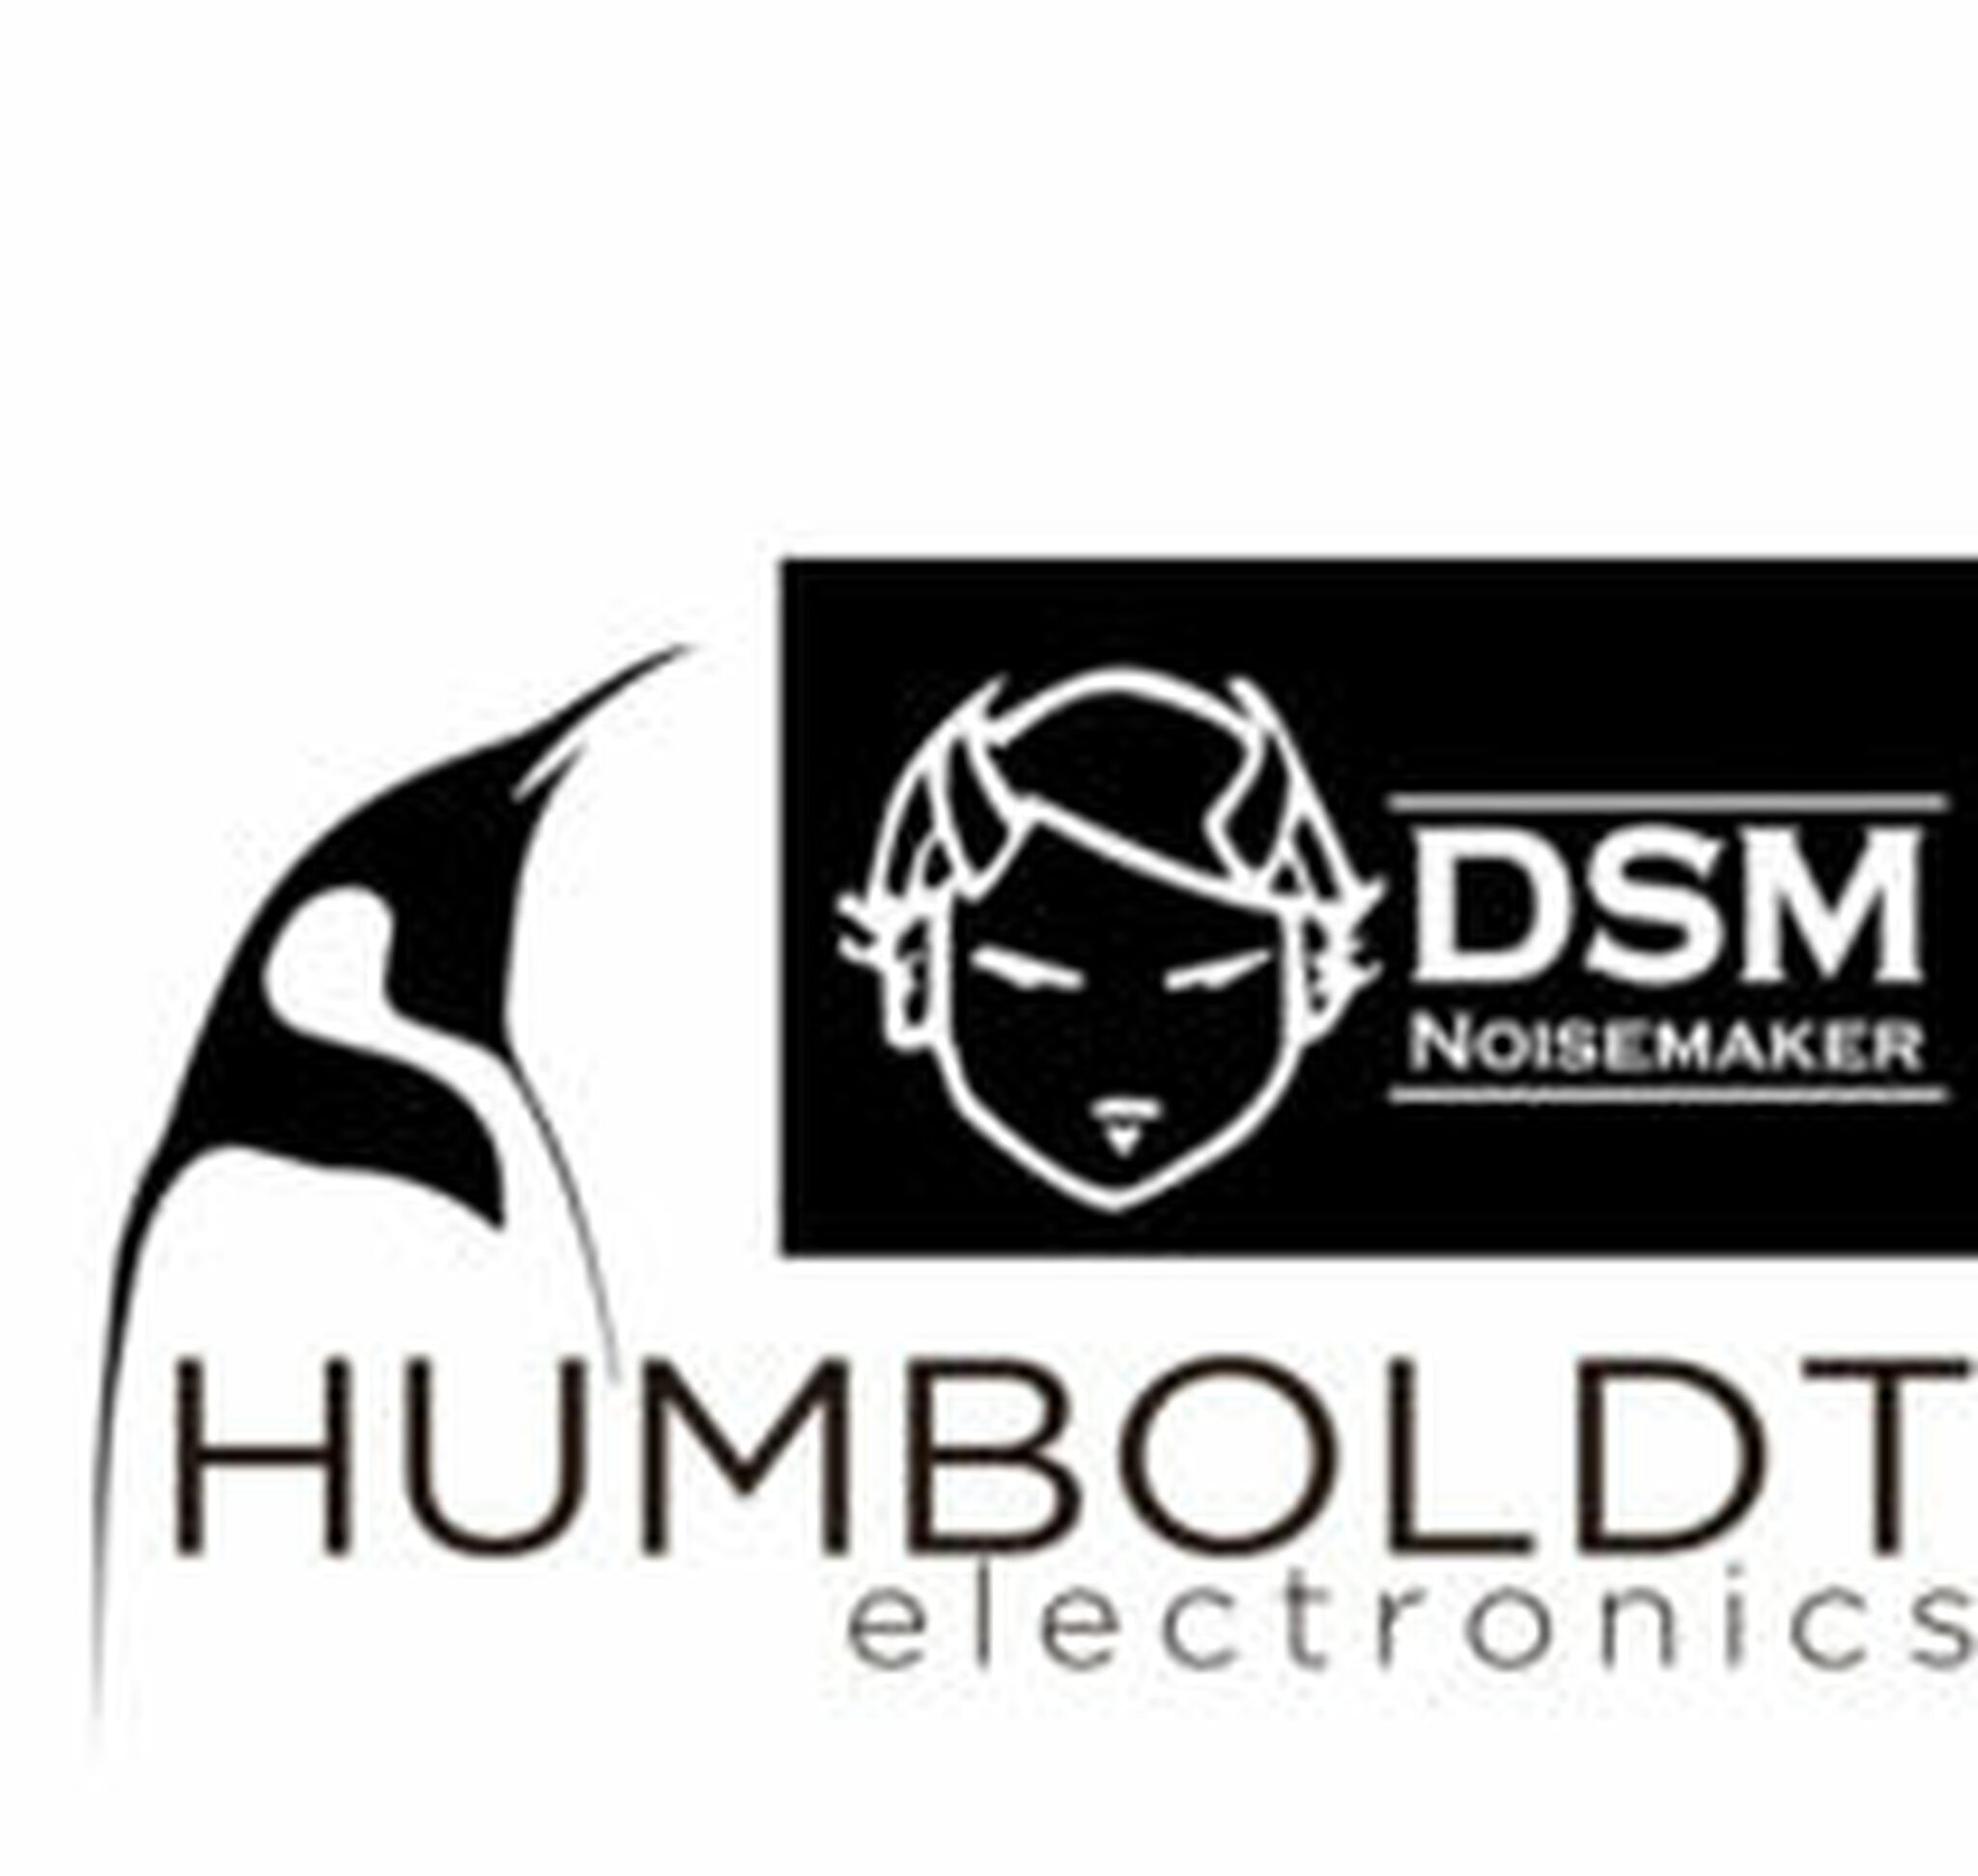 DSM-Humbolt